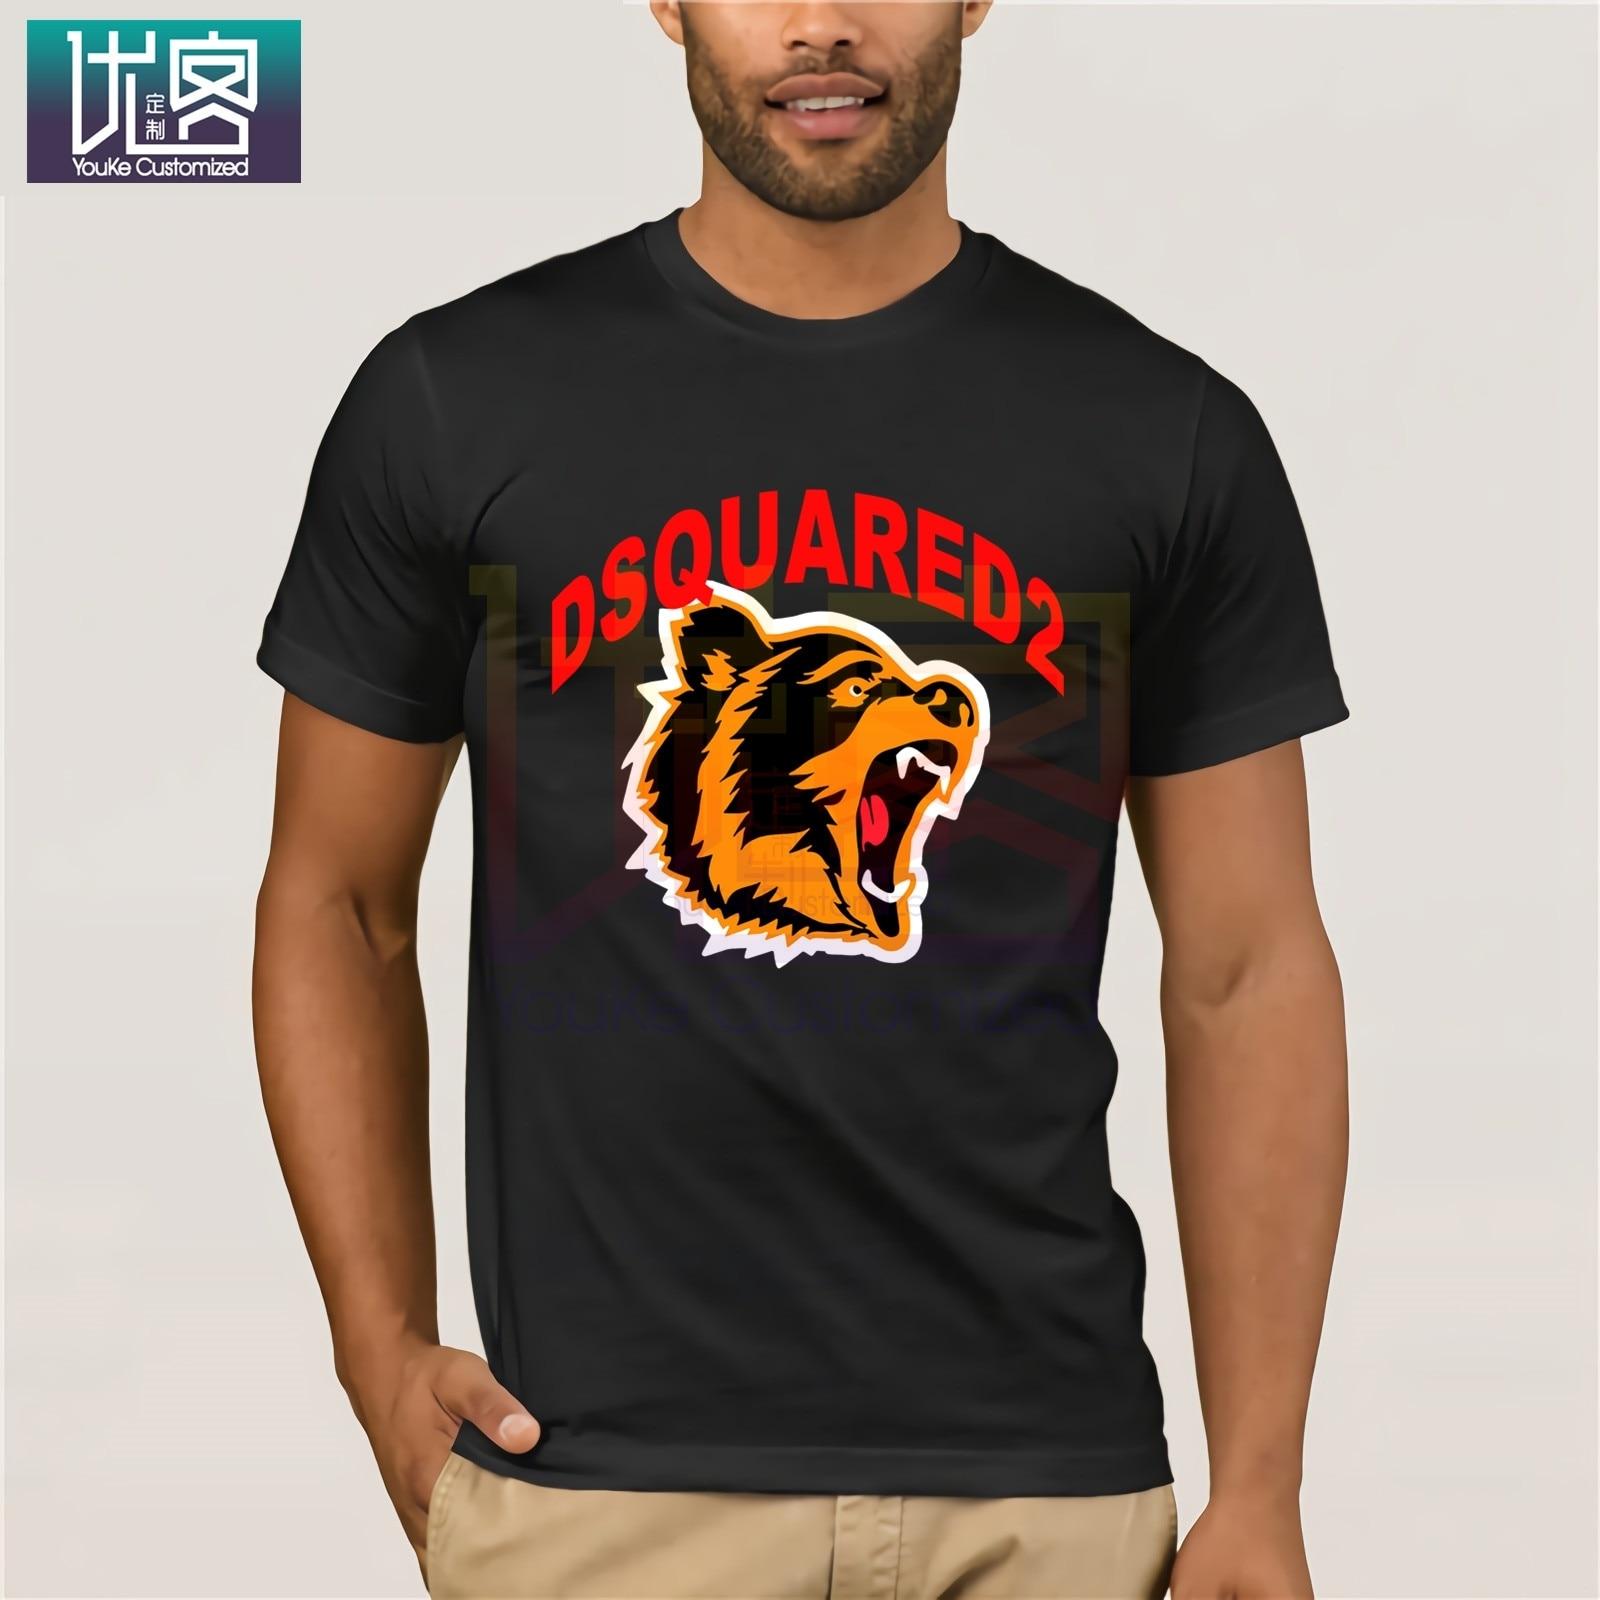 New Dsq2 Men'S T-Shirt Printed Tee Unisex Size S-3Xl Casual Short Sleeve Top Clothes Popular T-Shirt Crewneck 100% Cotton Tees